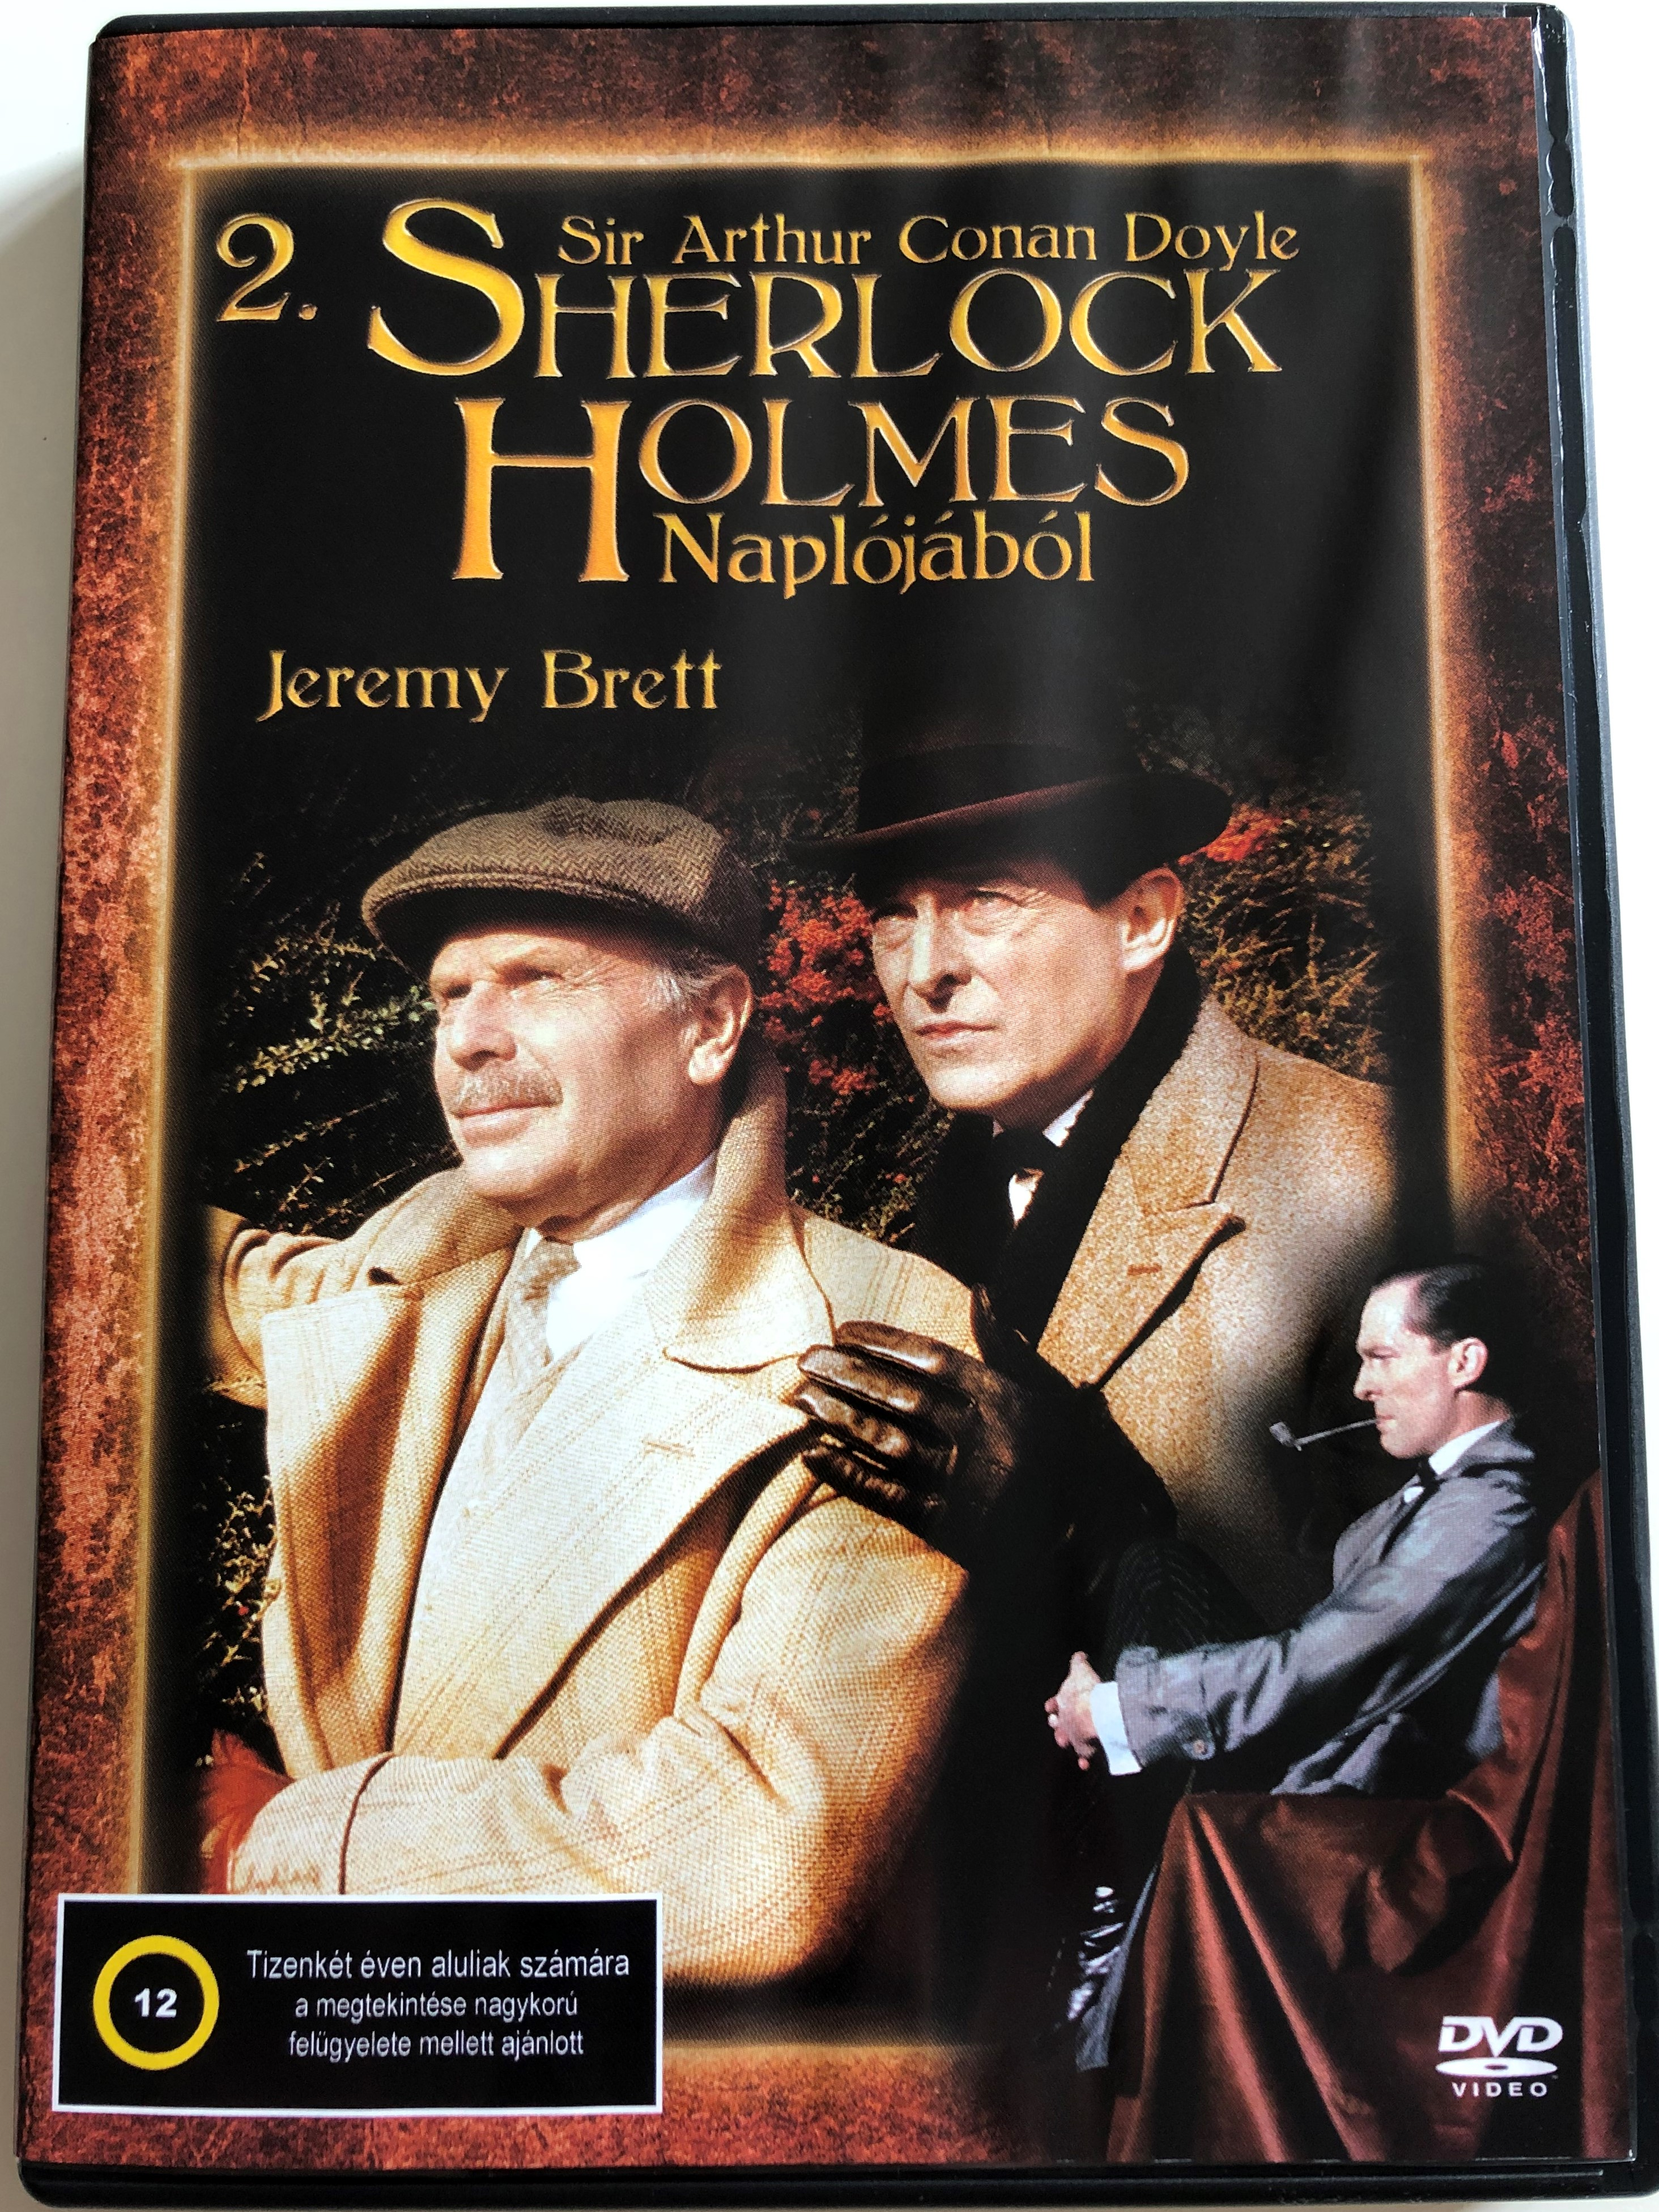 the-casebook-of-sherlock-holmes-dvd-1991-sherlock-holmes-napl-j-b-l-directed-by-john-madden-michael-a.-simpson-patrick-lau-june-howson-tim-sullivan-starring-jeremy-brett-edward-hardwicke-rosalie-williams-cheryl-1-.jpg